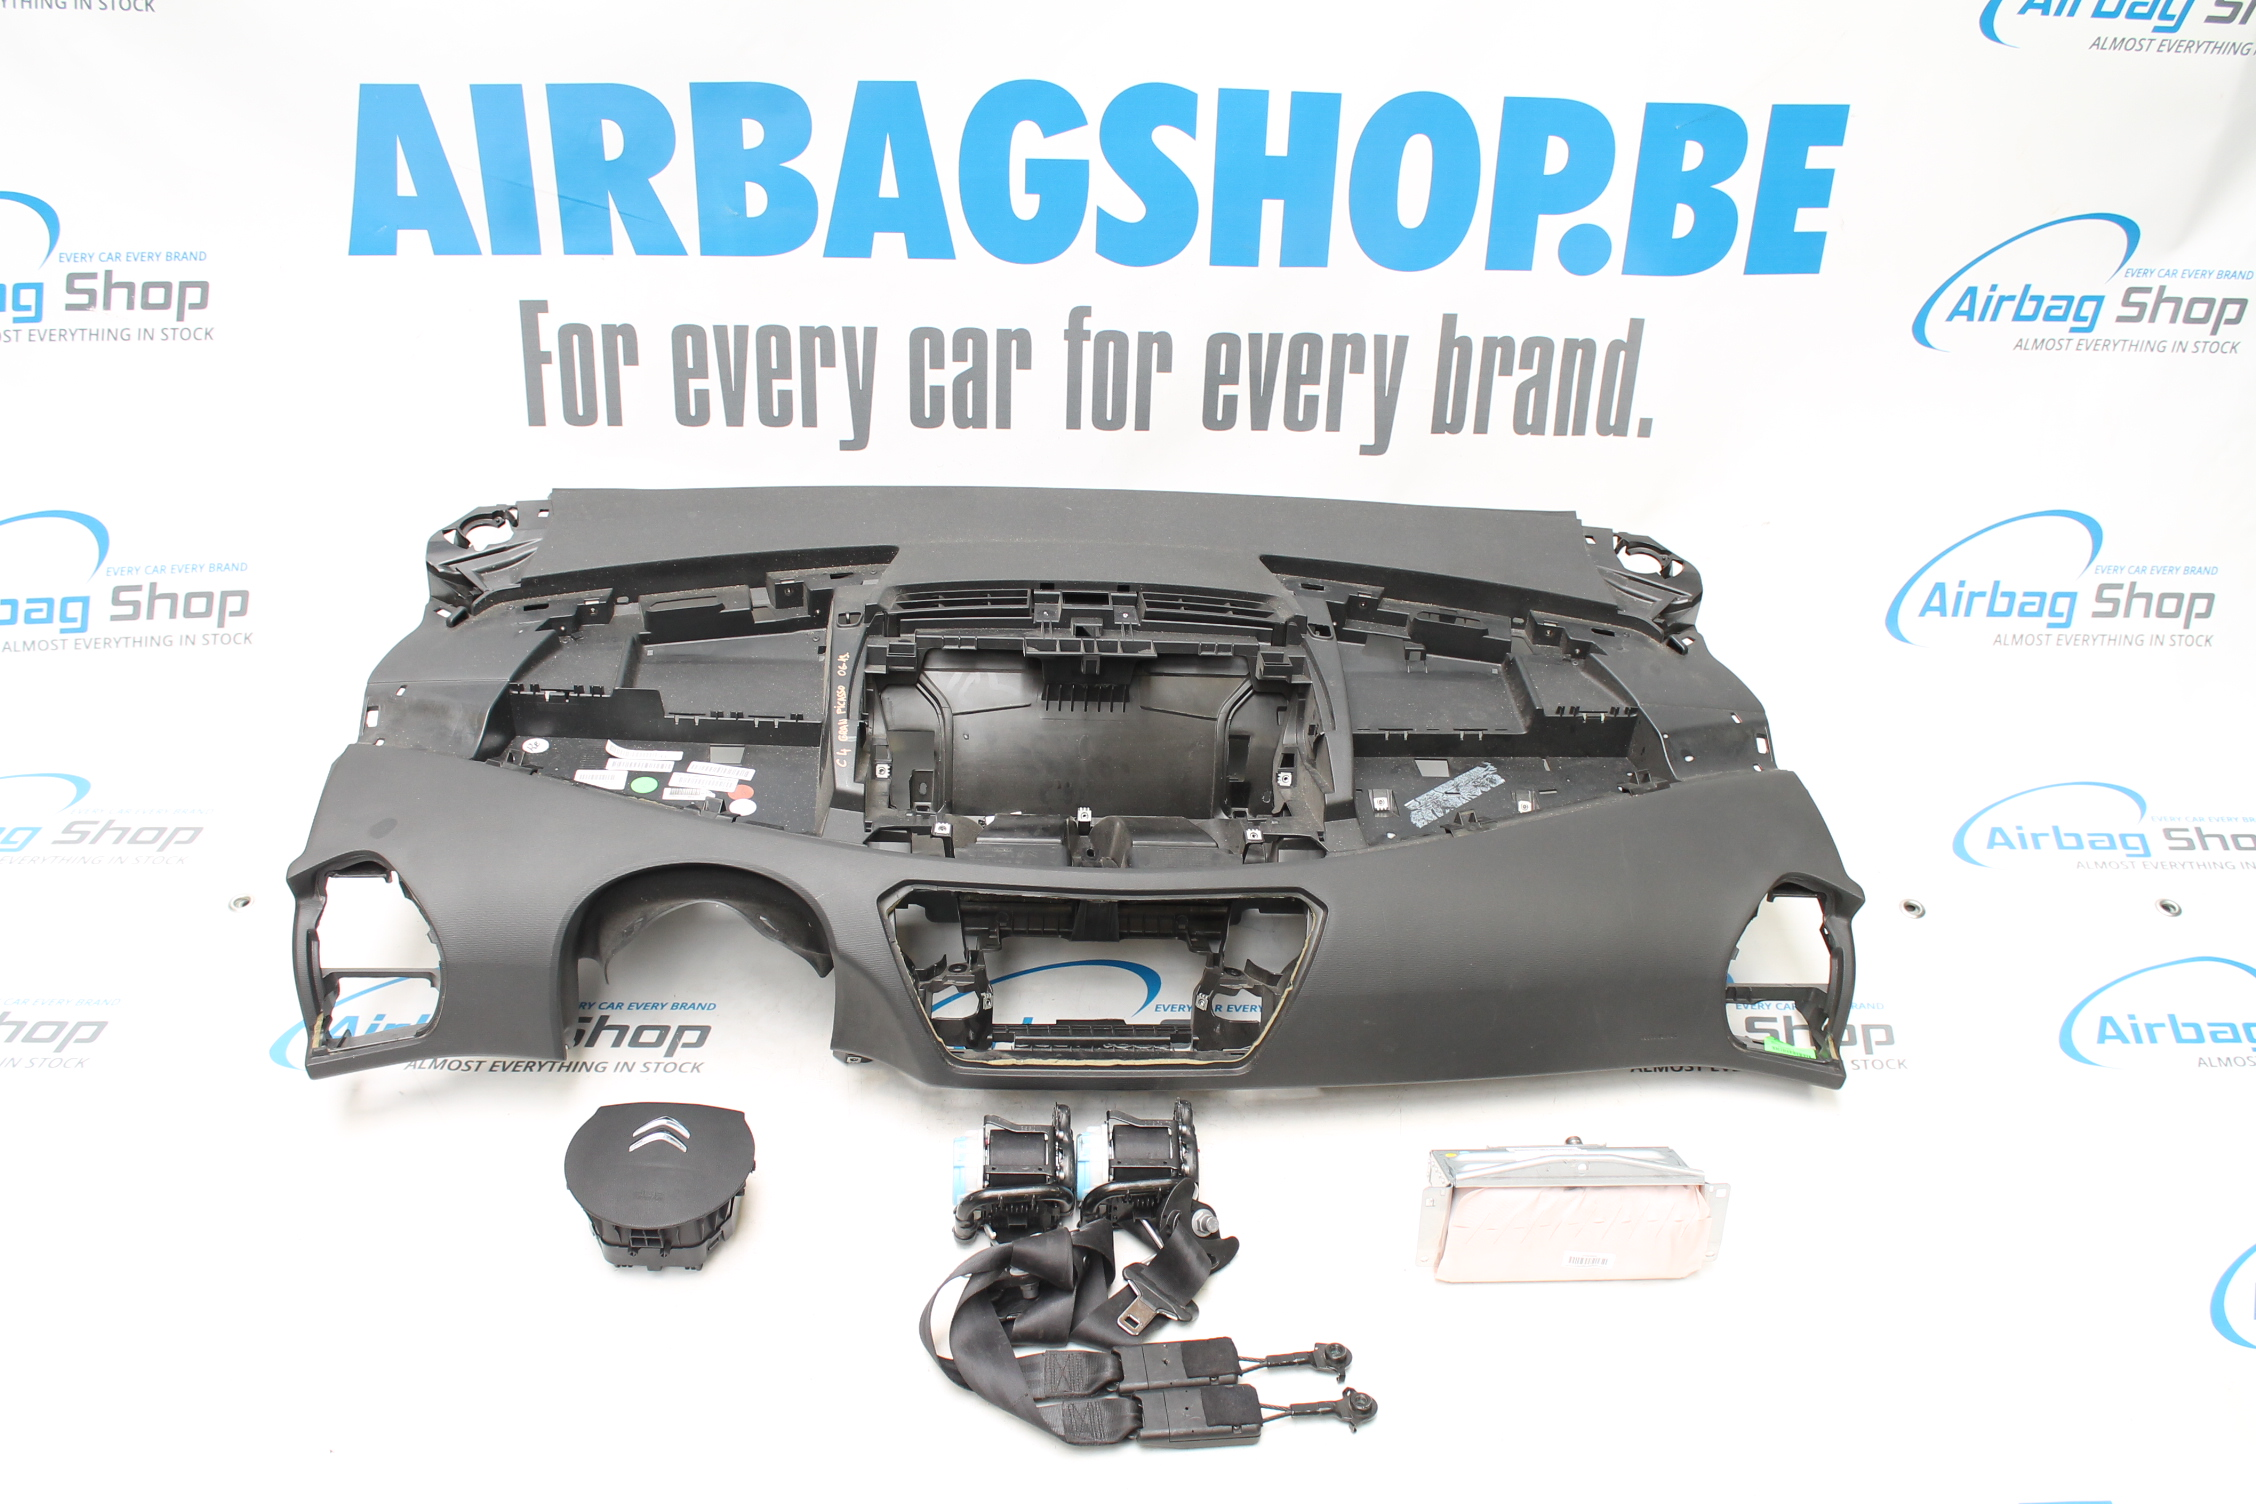 airbag kit tableau de bord citroen c4 picasso 2006 2013 airbag shop. Black Bedroom Furniture Sets. Home Design Ideas